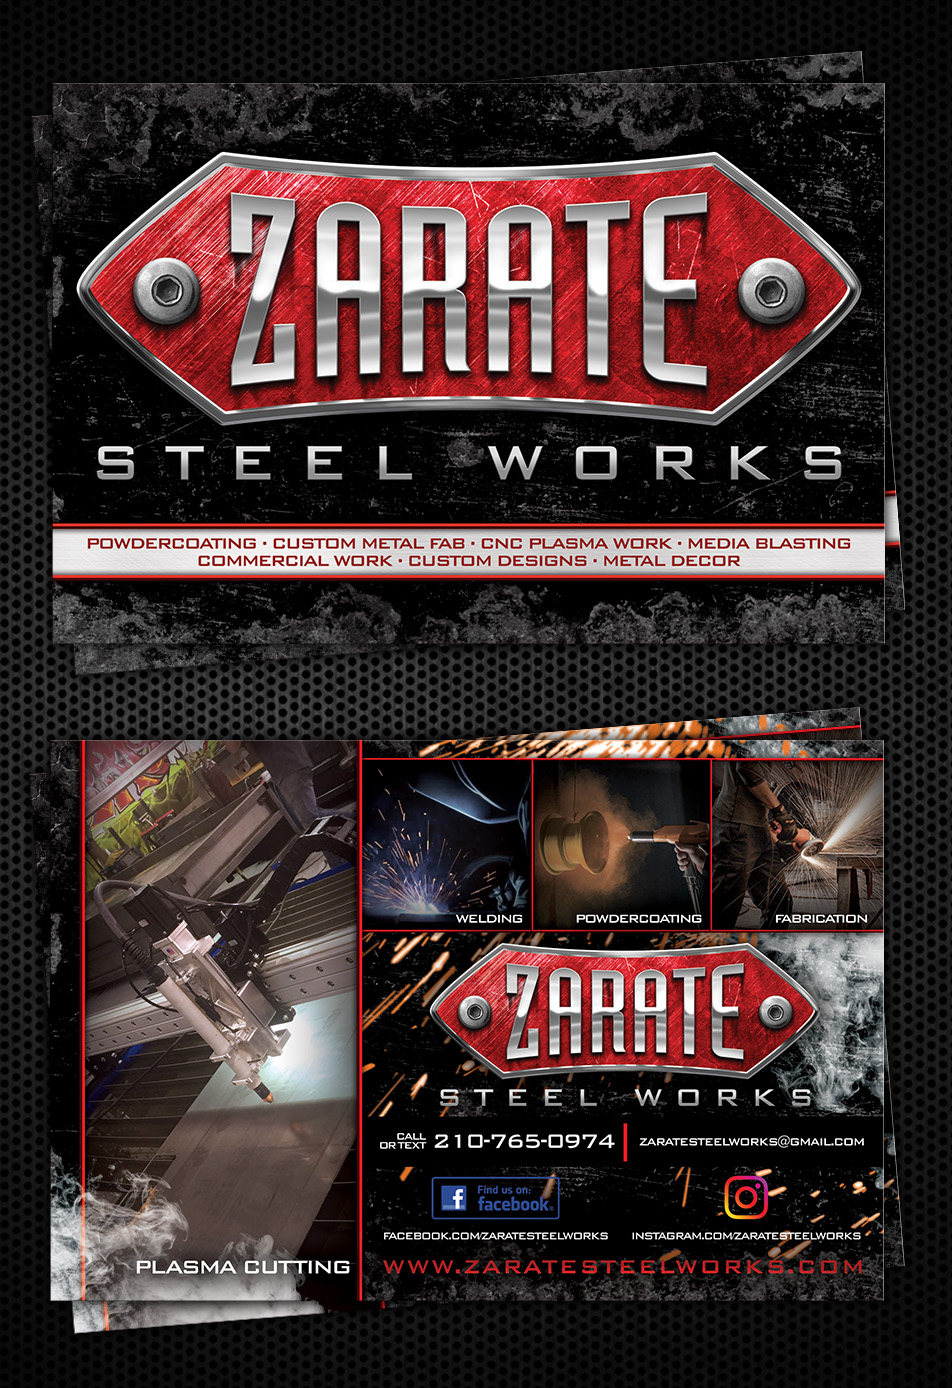 Zarate SW 4x6 PROOF 3.jpg